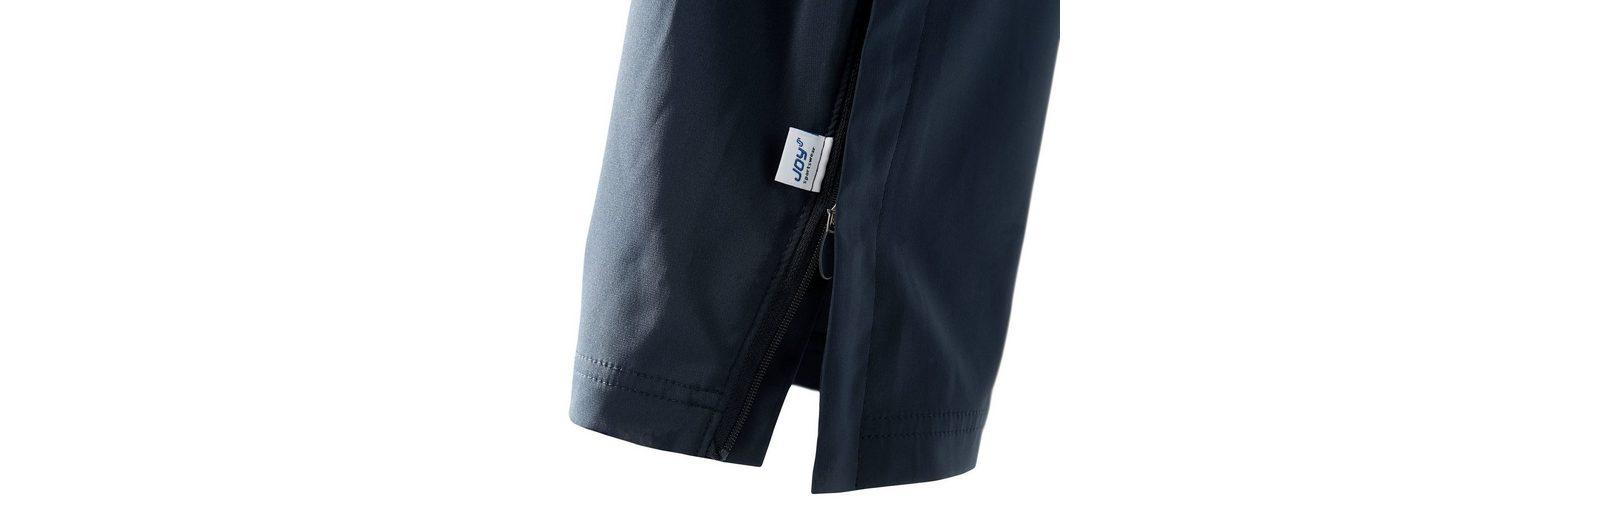 Joy Sportswear Trainingshose NIELS Sneakernews 0A7v427A